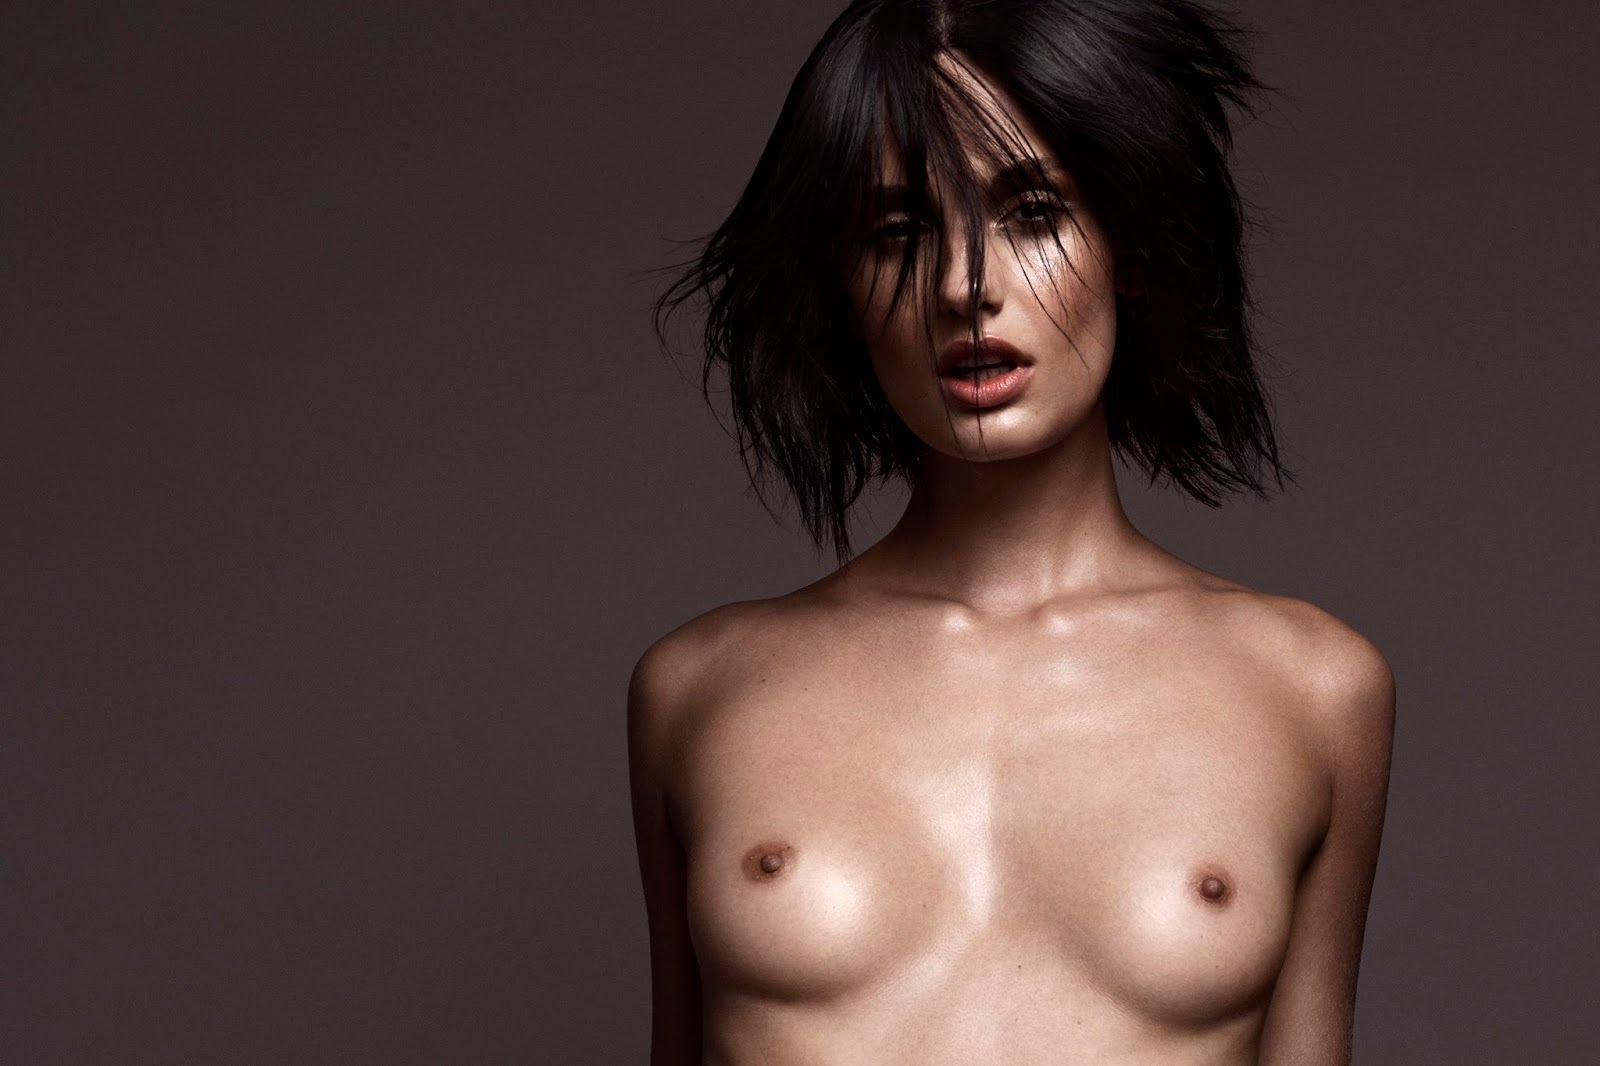 Anal hanna alstrom nude